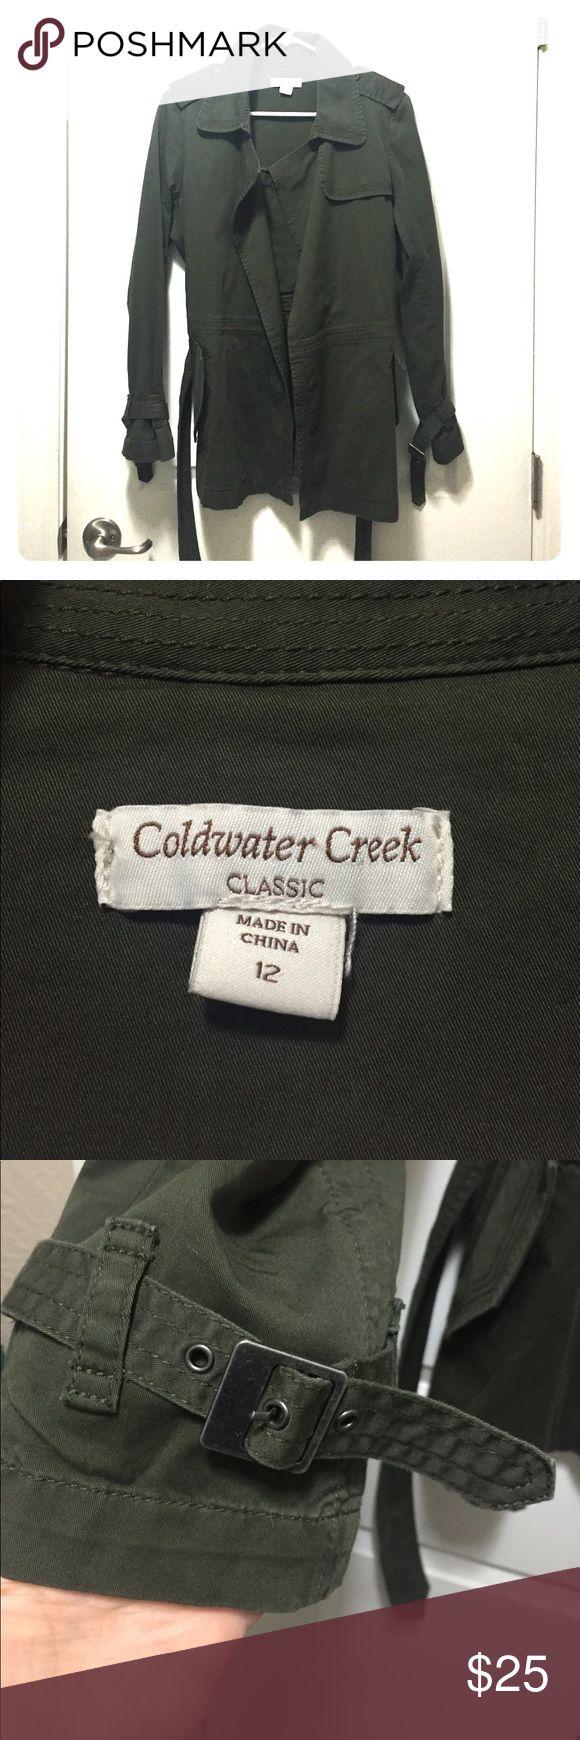 Coldwater Creek Jacket size 12 Gorgeous Coldwater Creek olive green jacket, size 12. 98% cotton, 2% spandex. Belt closure, no buttons. Excellent condition, beautiful details. Coldwater Creek Jackets & Coats